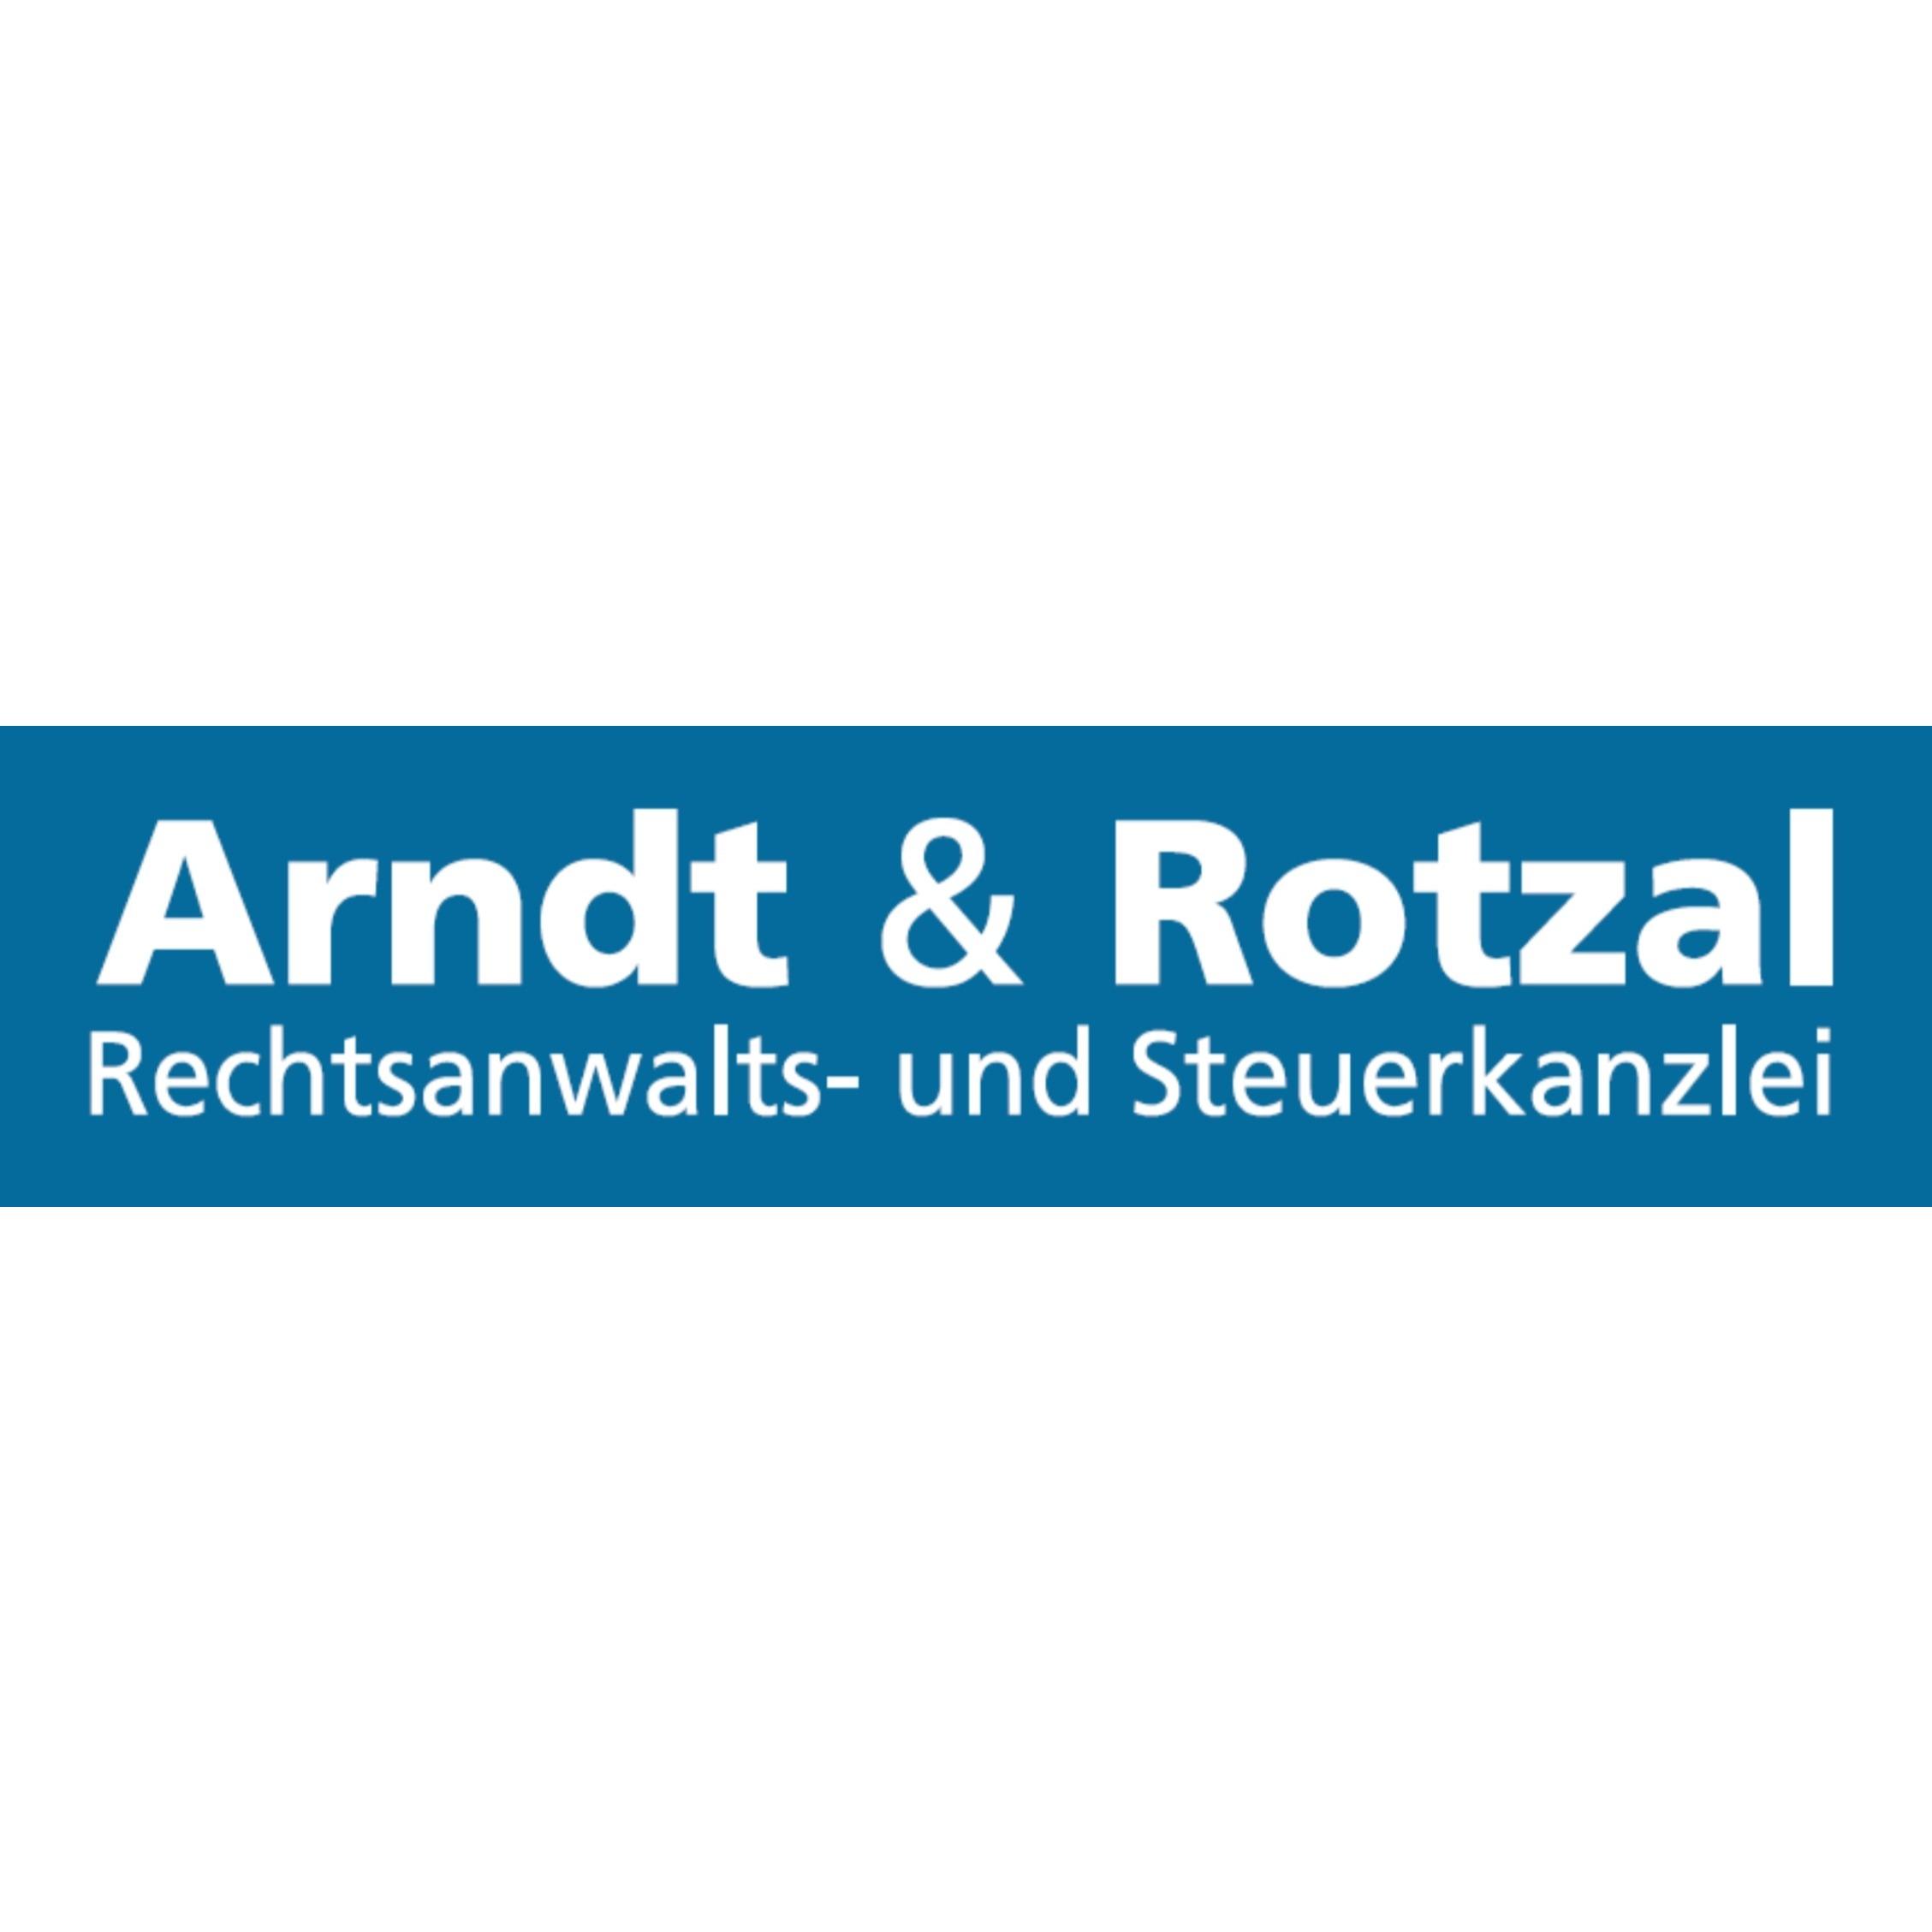 Arndt & Rotzal Rechtsanwalts- und Steuerkanzlei